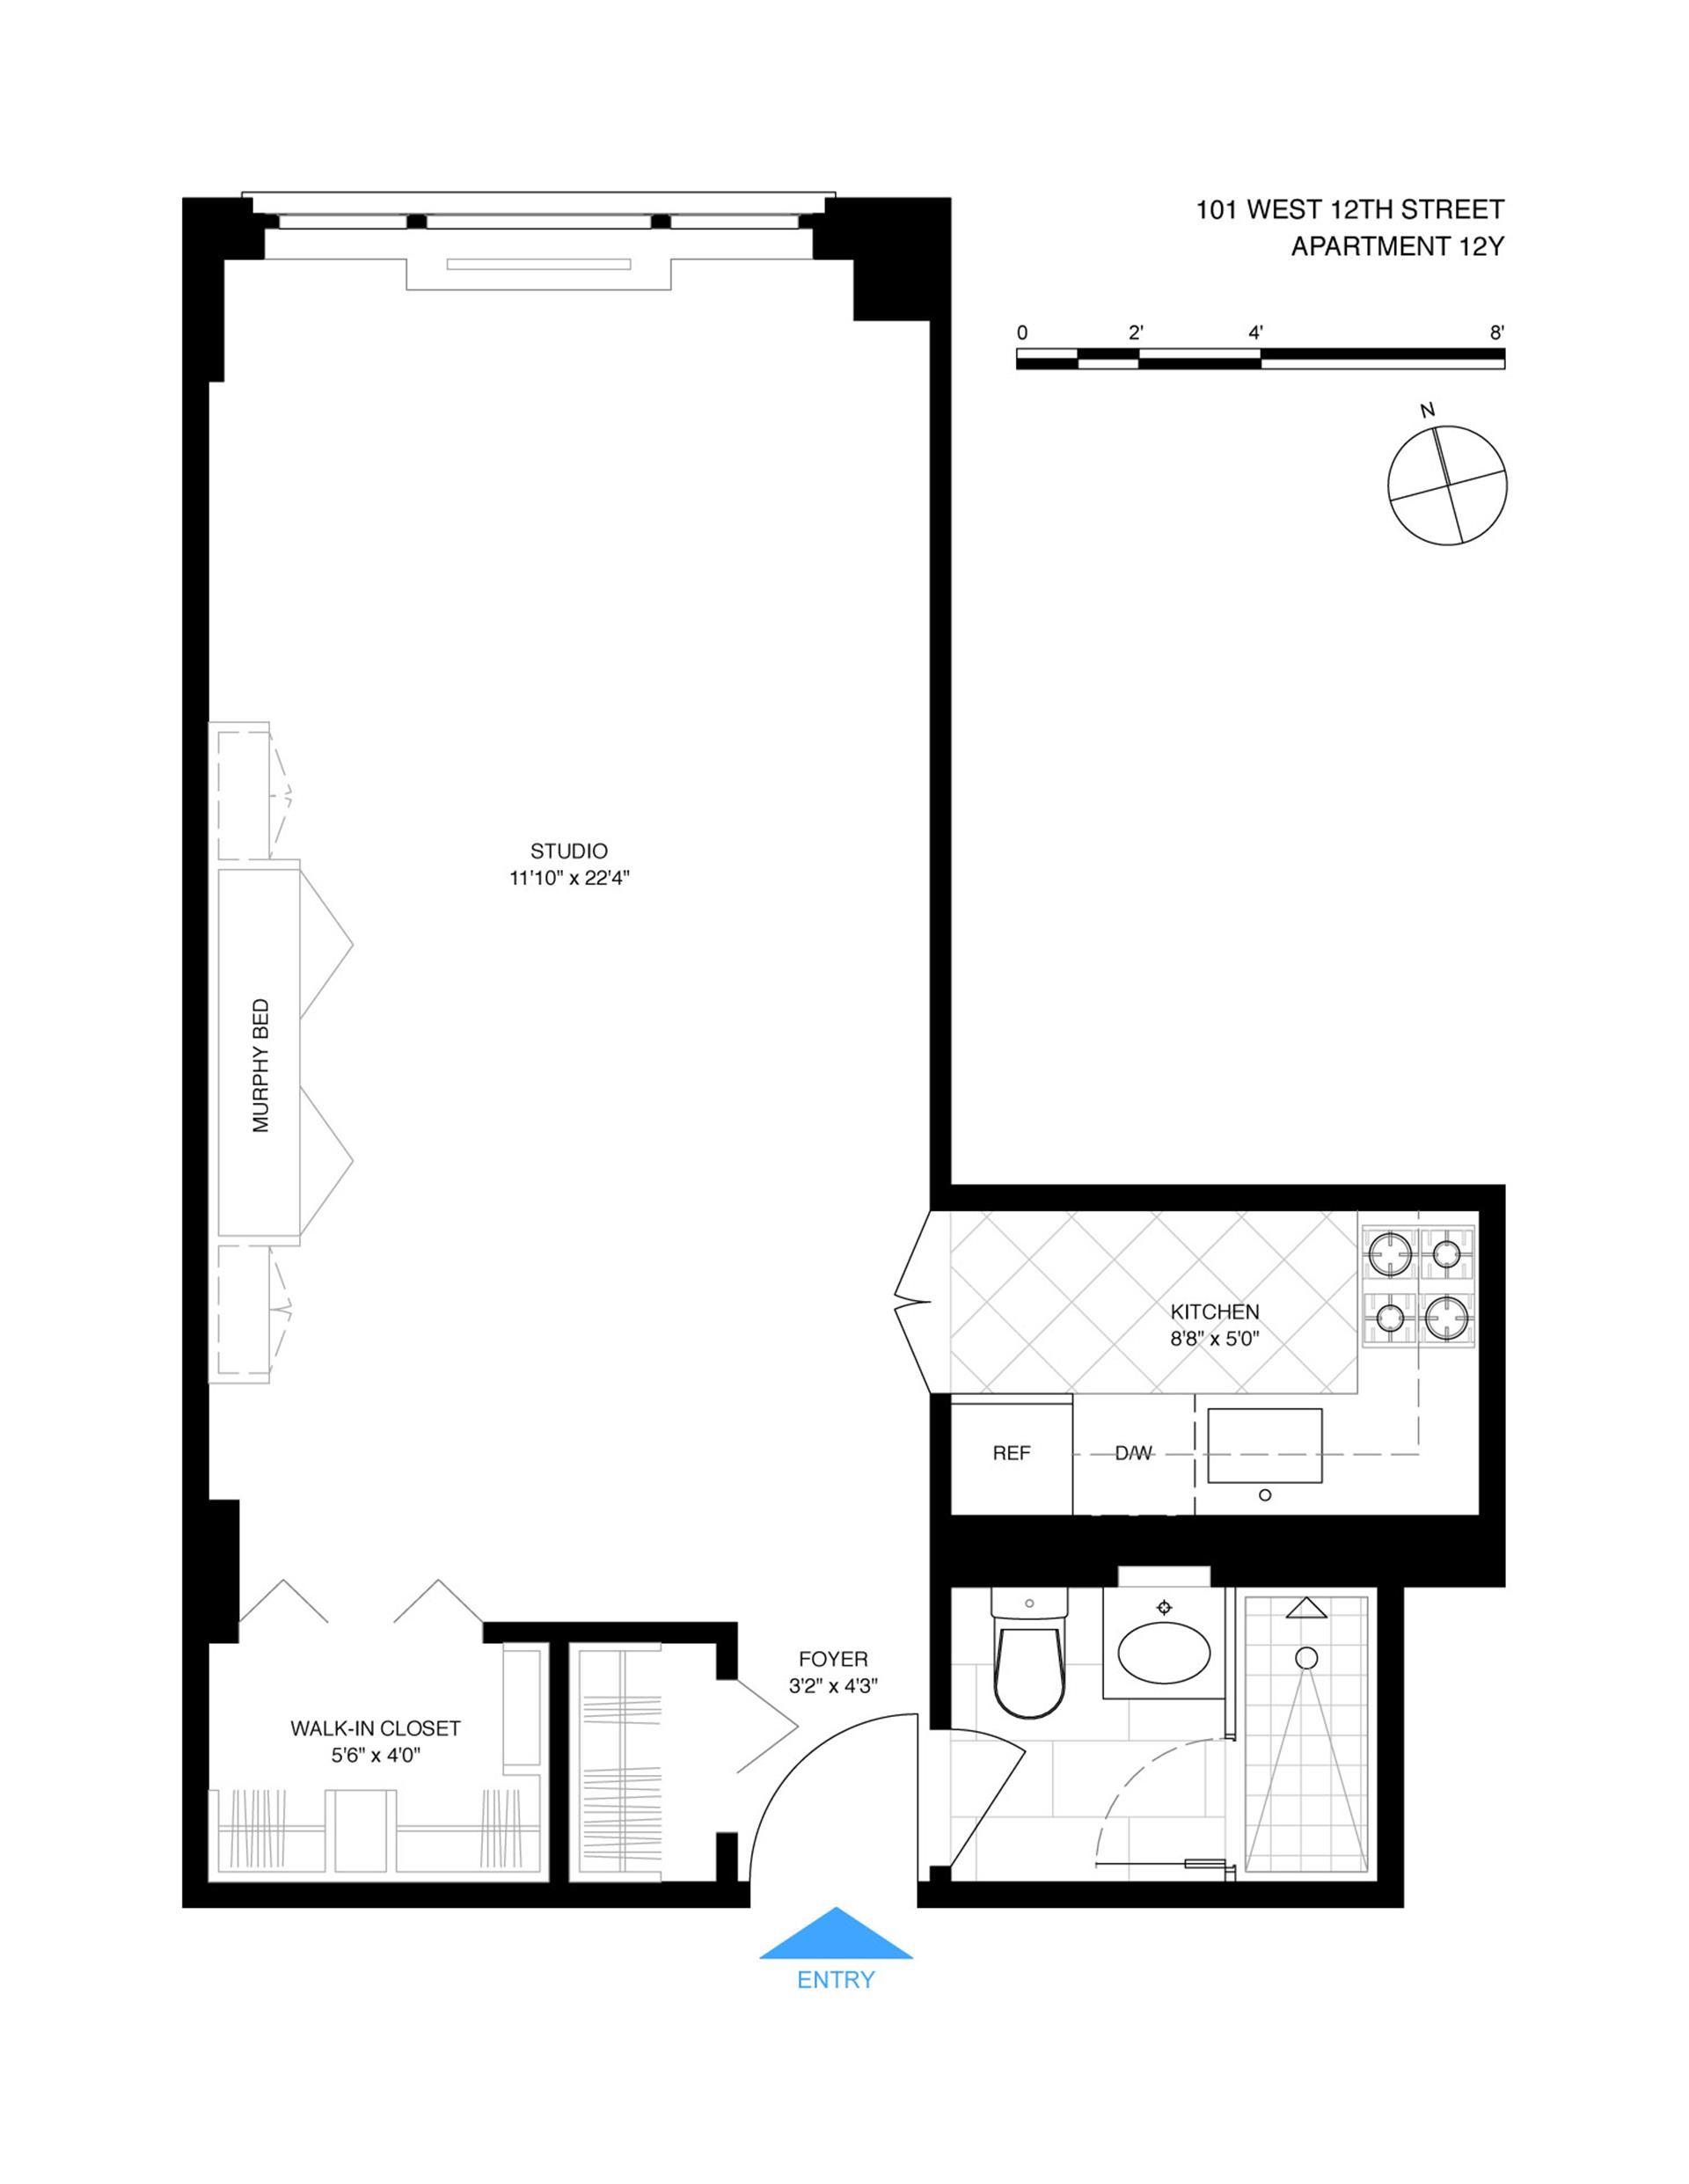 Floor plan of 101 West 12th Street, 12Y - Greenwich Village, New York